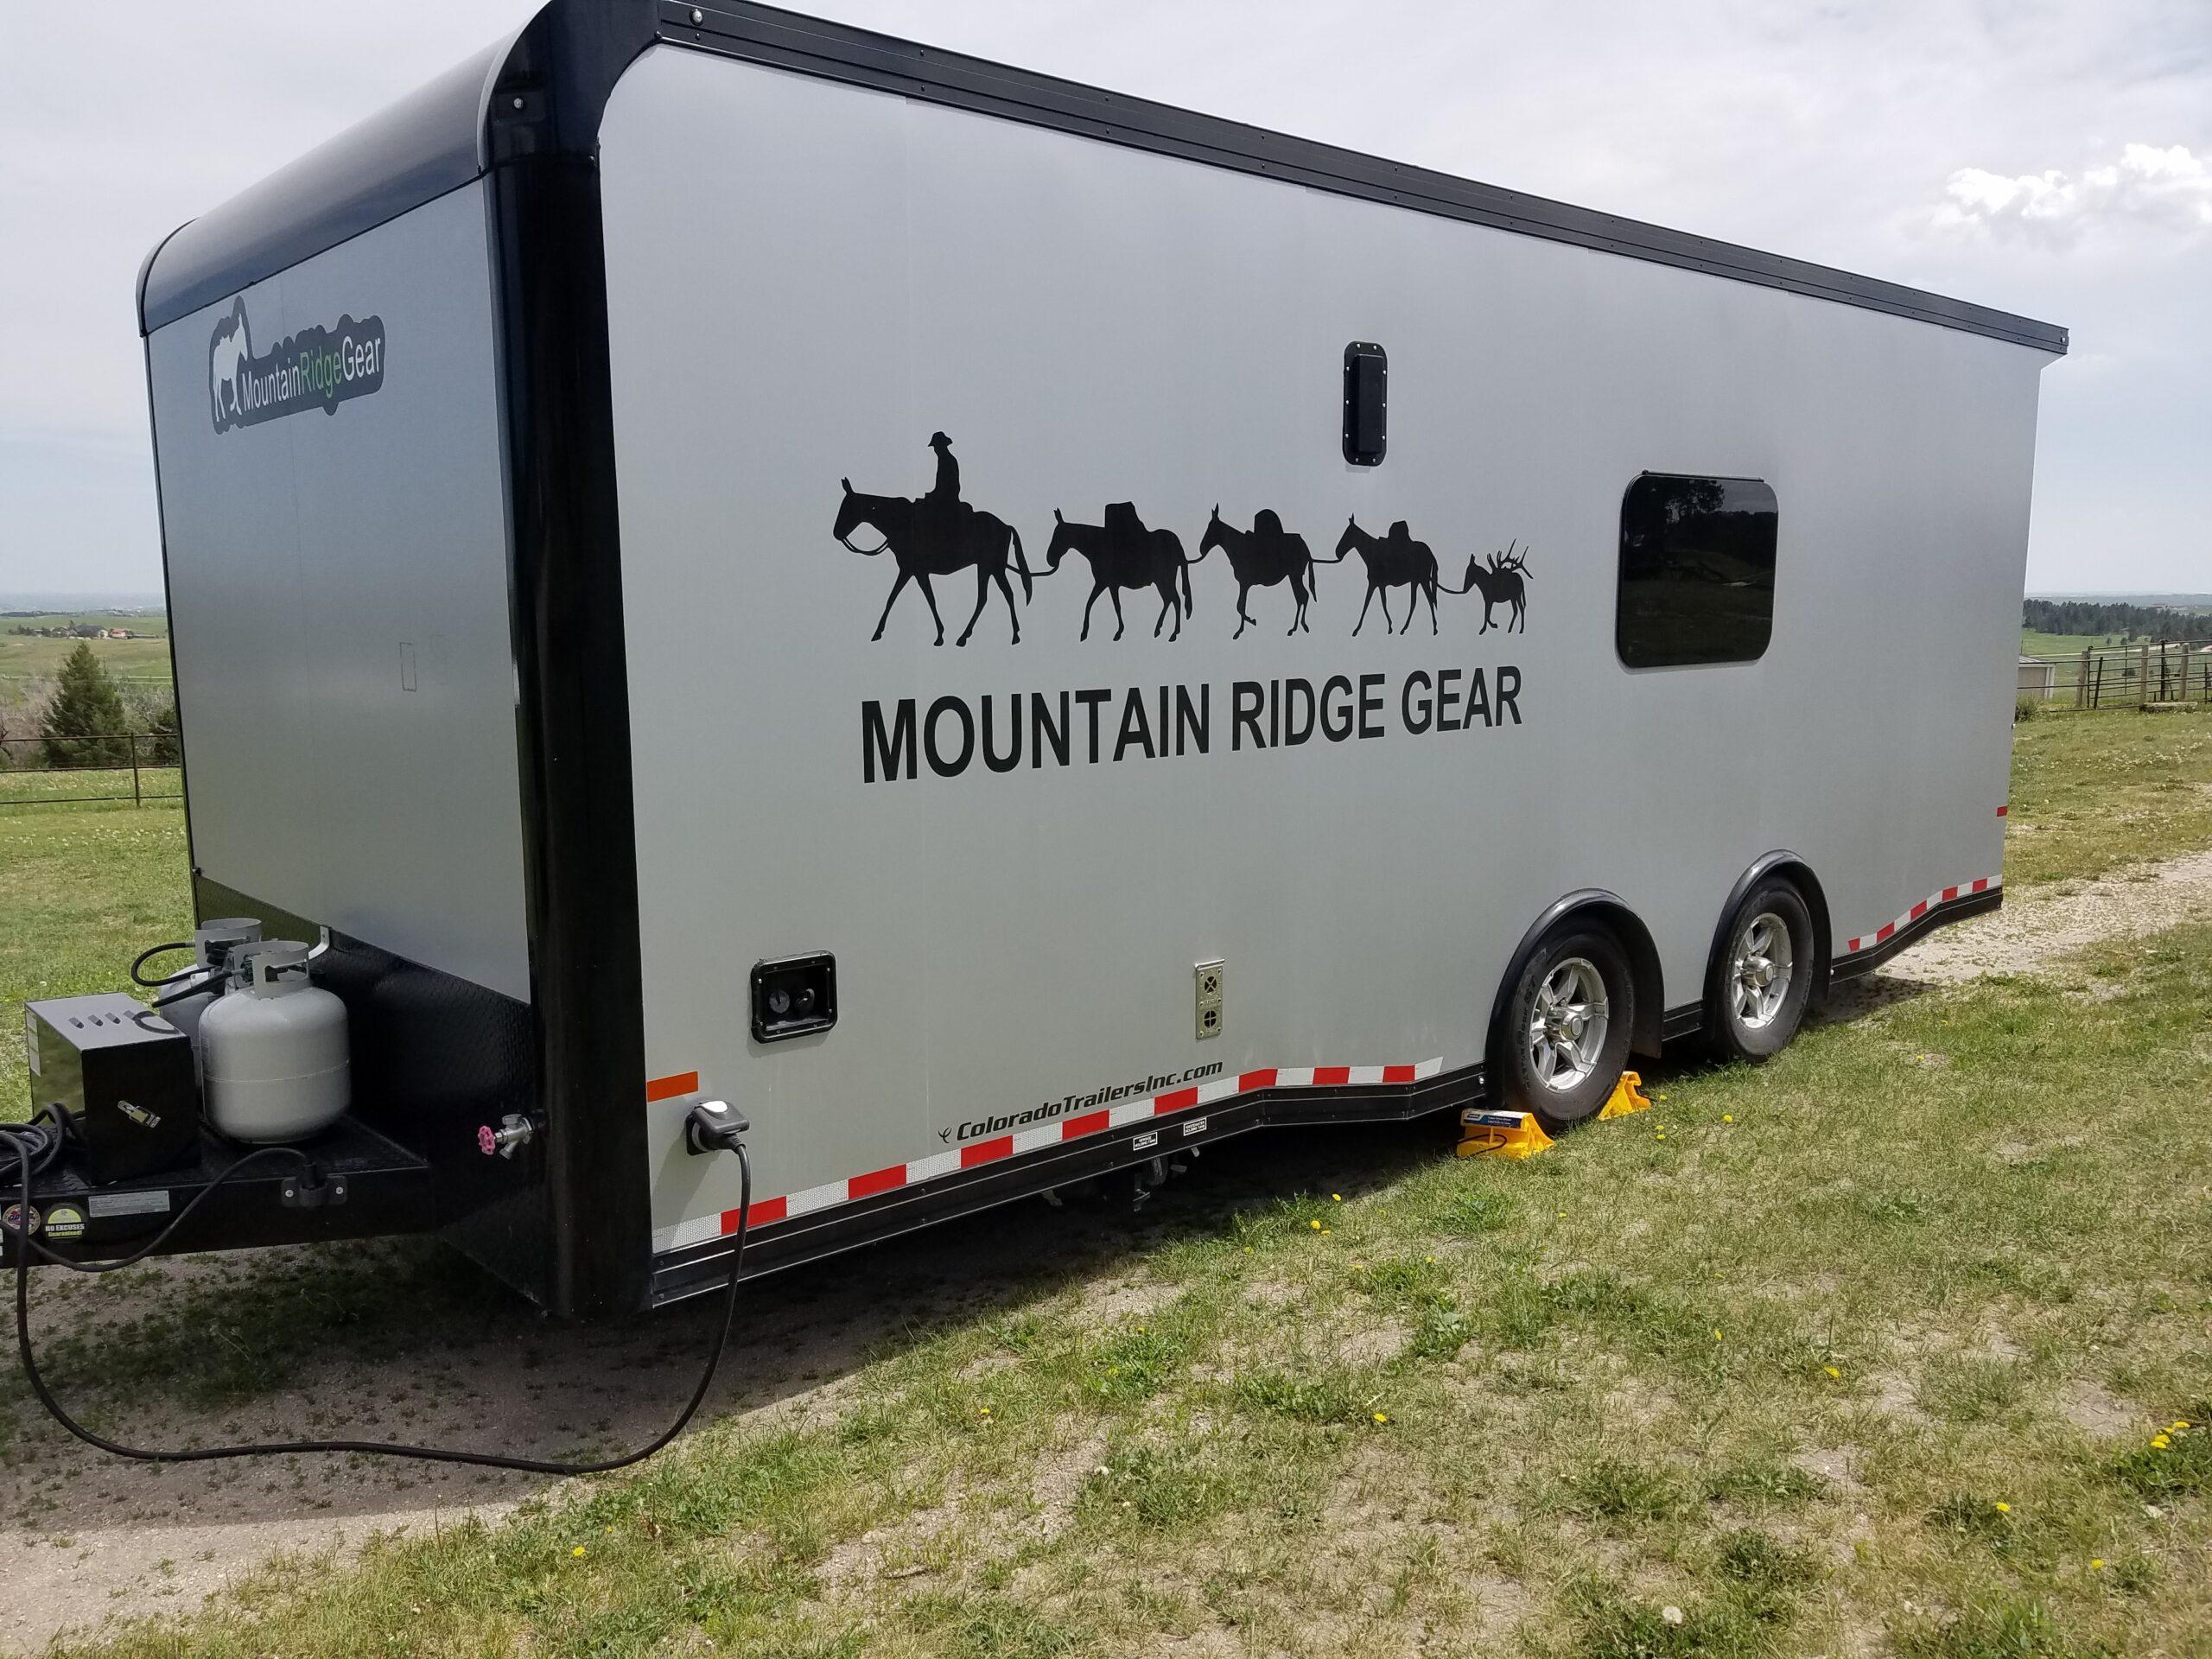 Mountain-ridge-gear-mobile-command